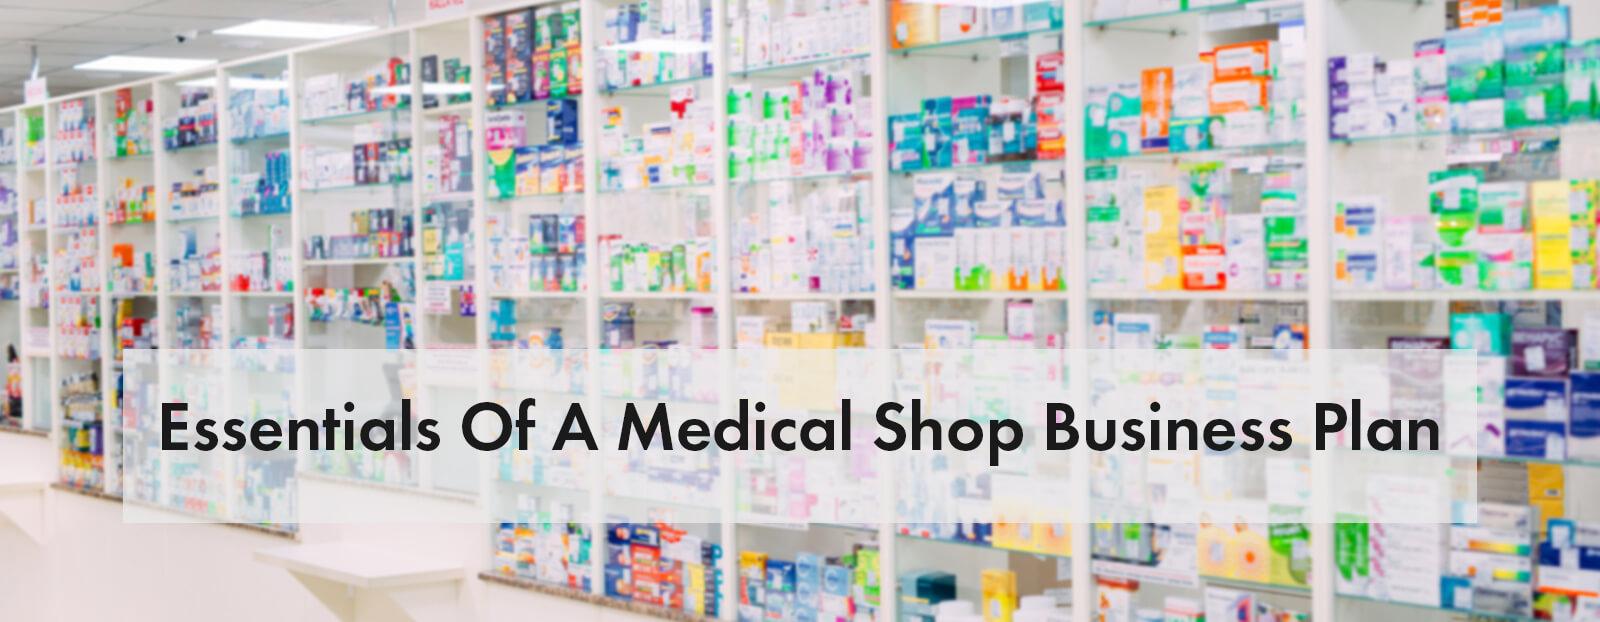 Essentials Of A Medical Shop Business Plan